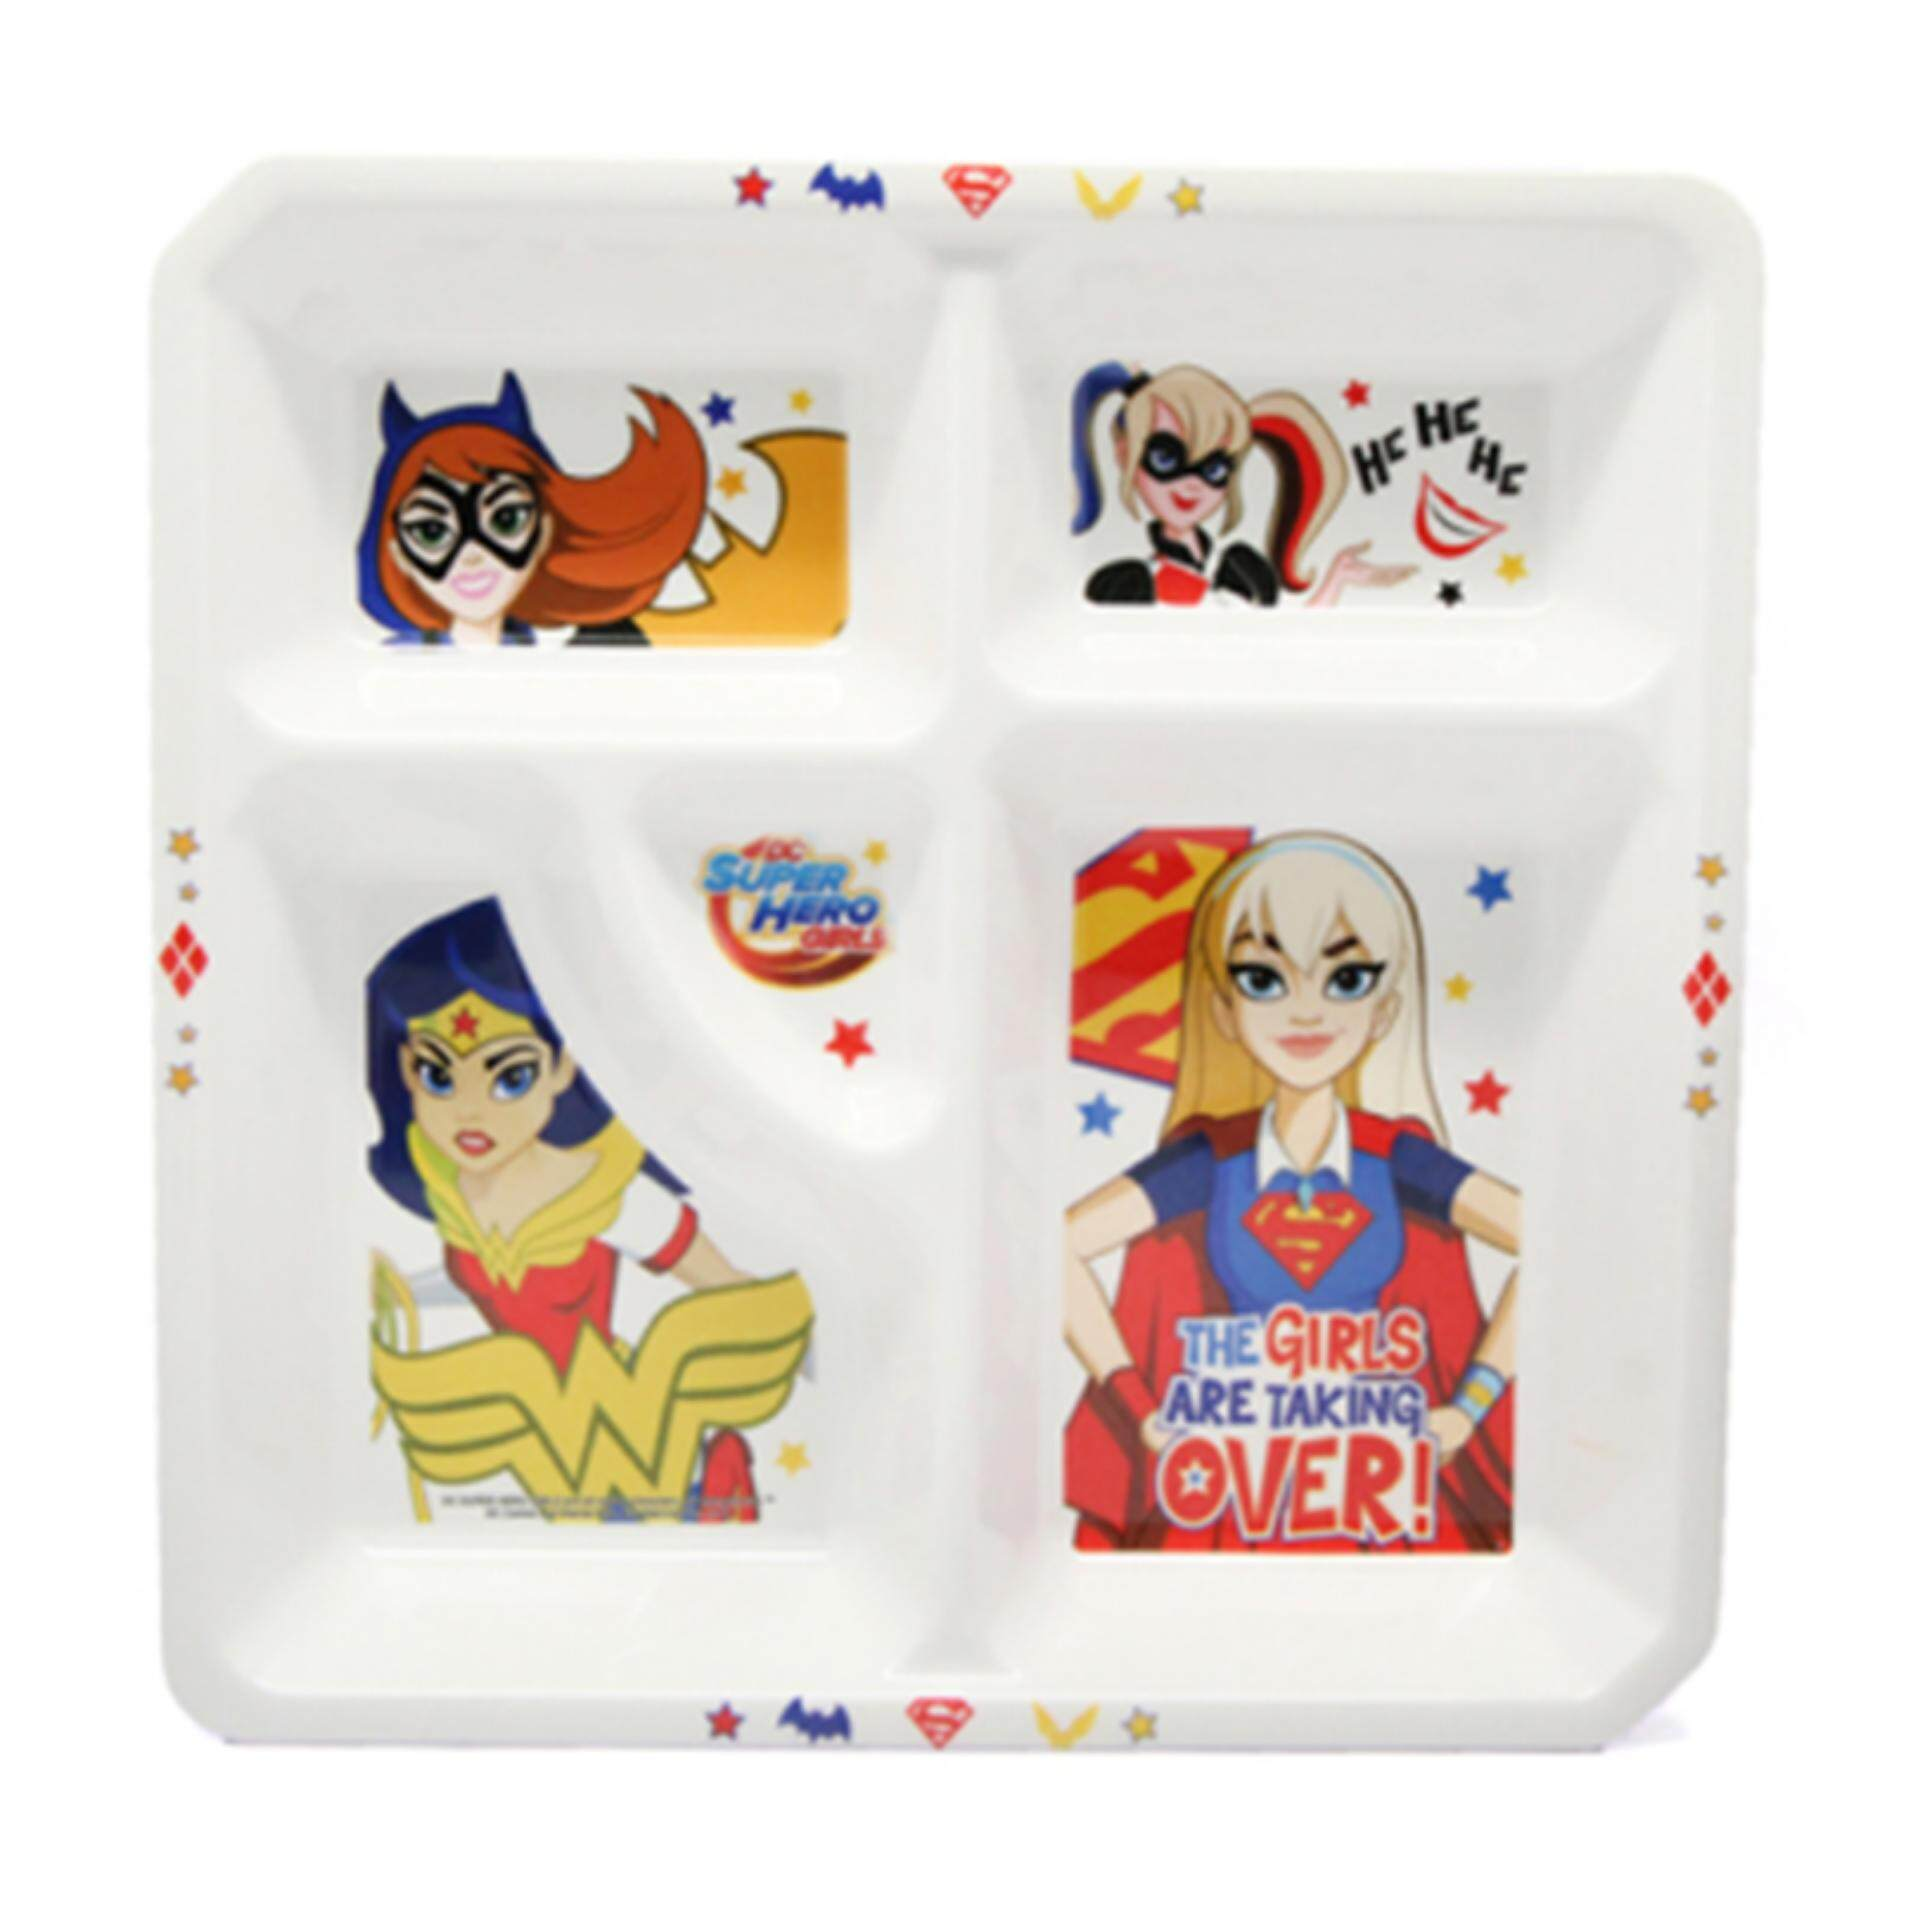 DC Comics Super Hero Girls Divided Plate - White Colour